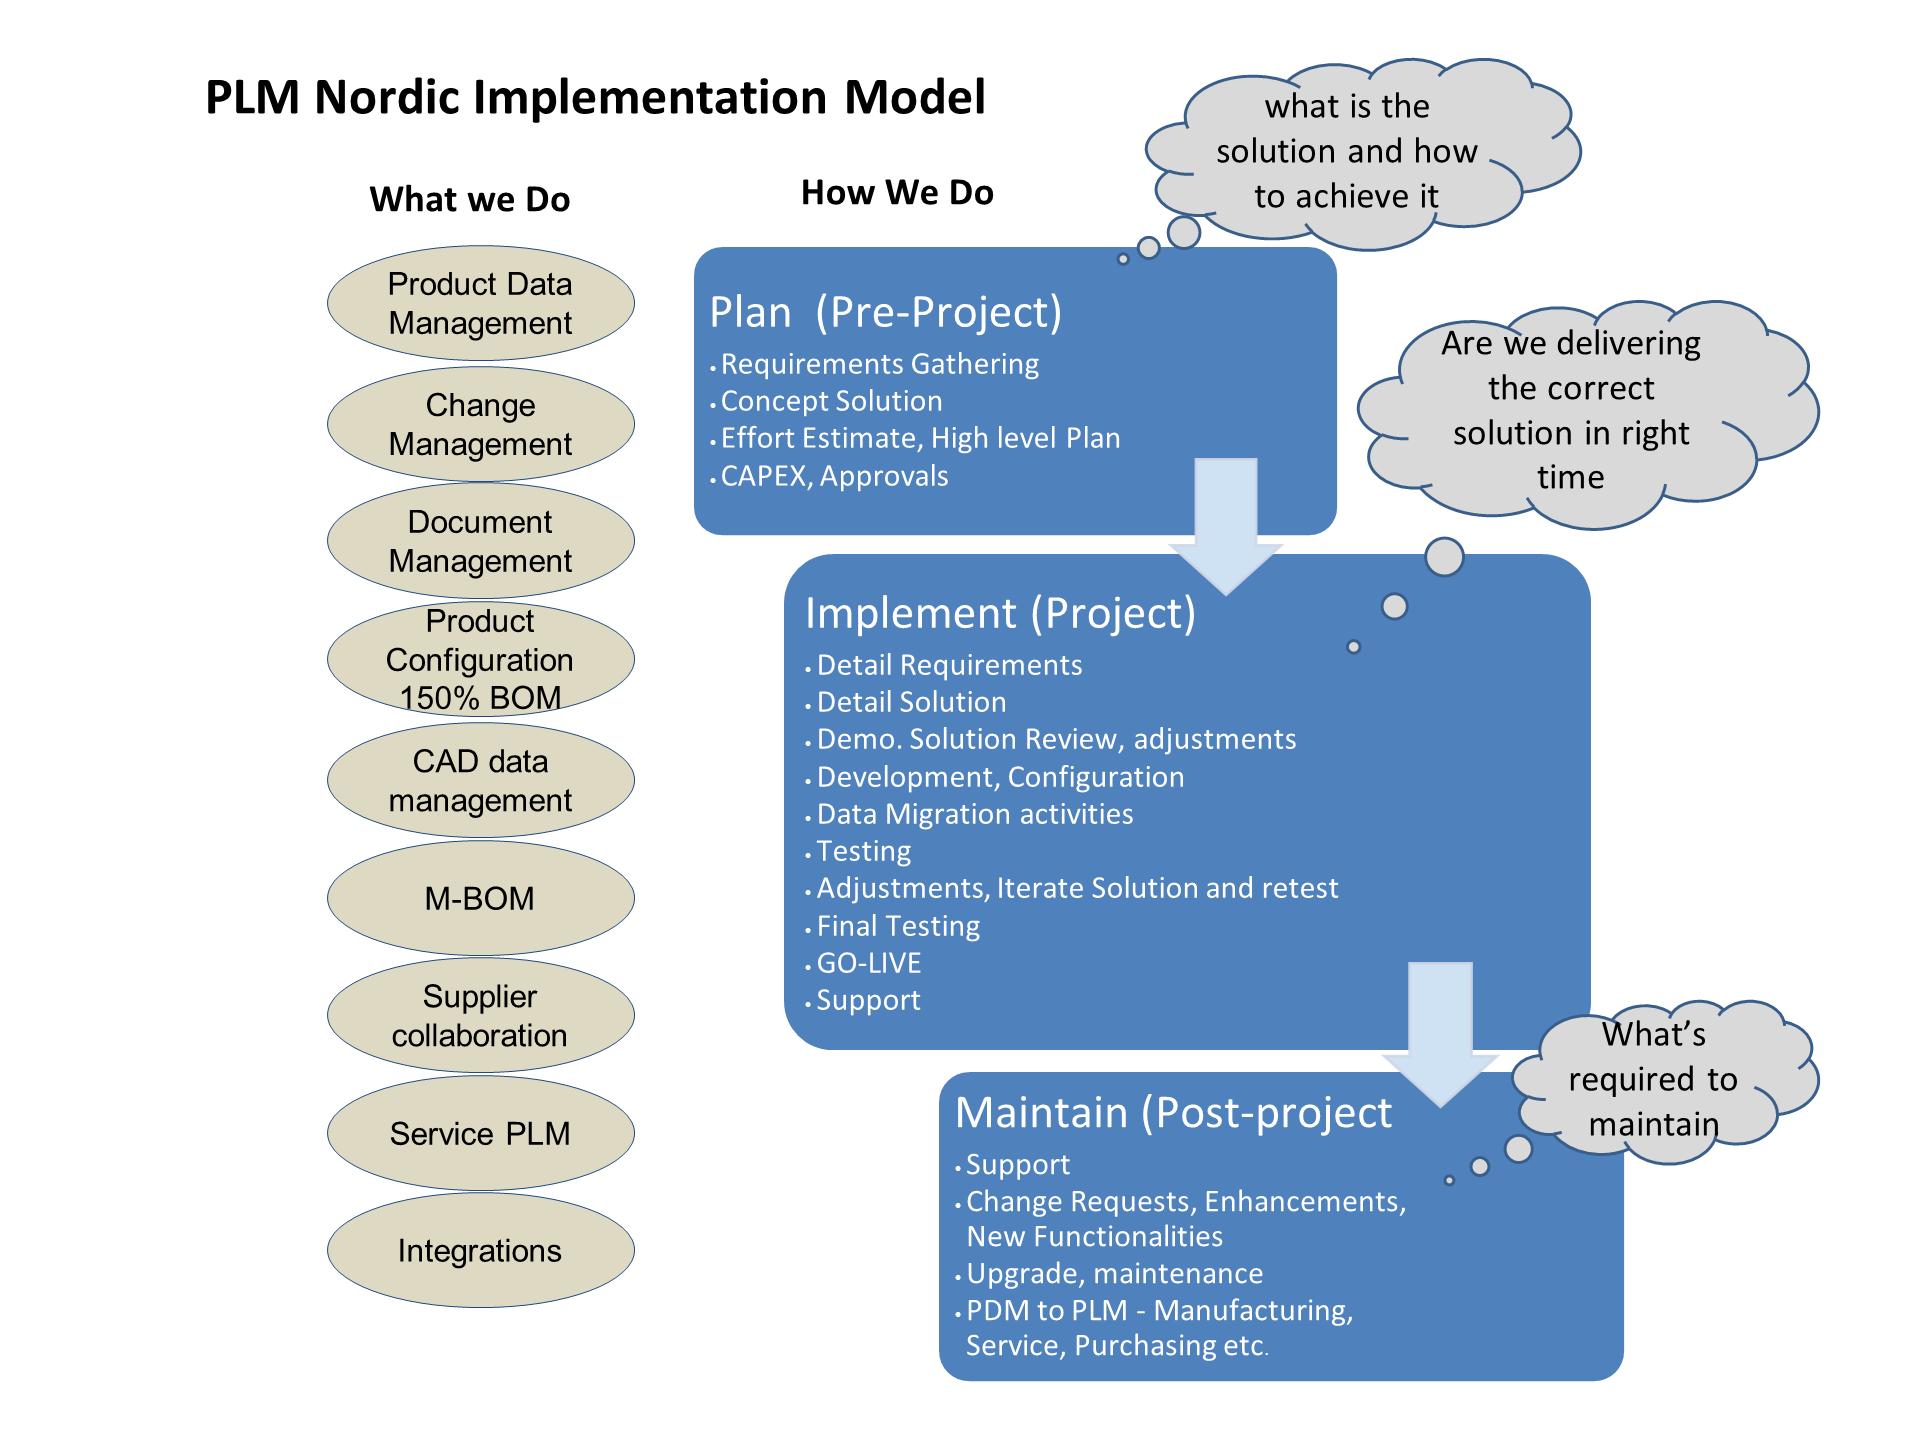 PLM Nordic Implementation Model